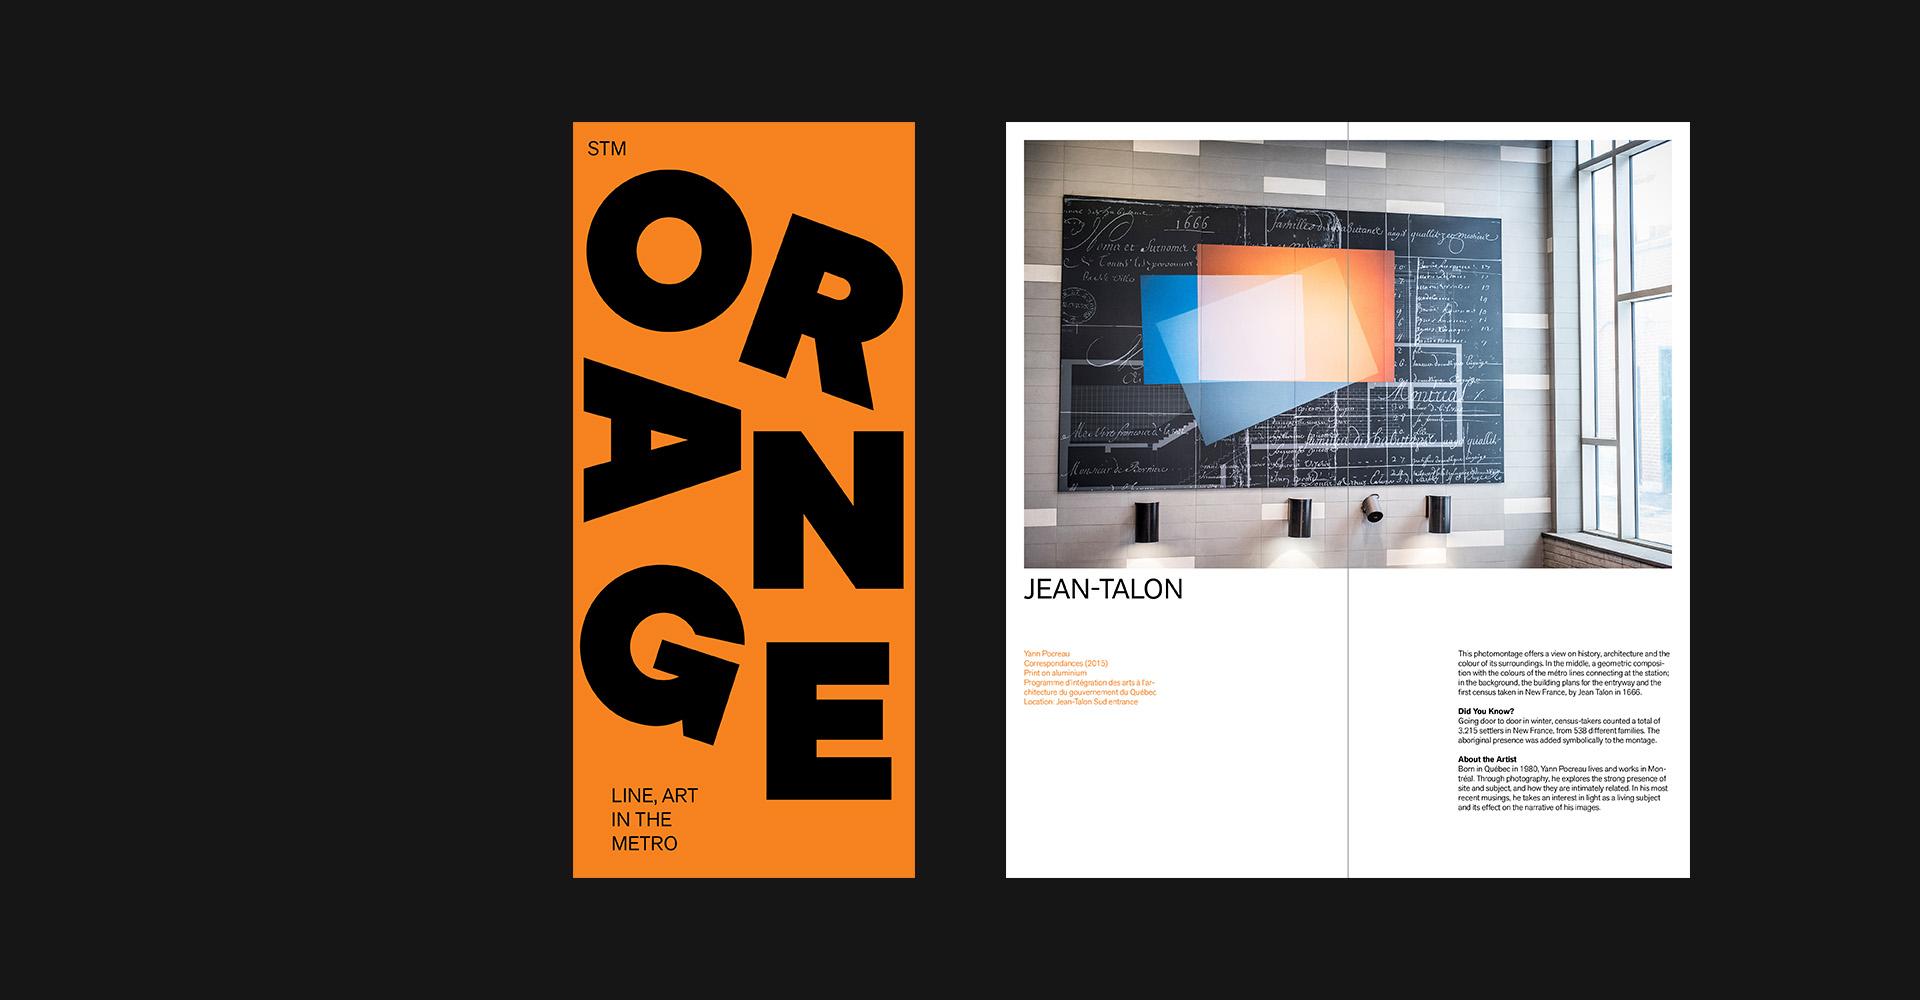 STM Orange Spreads